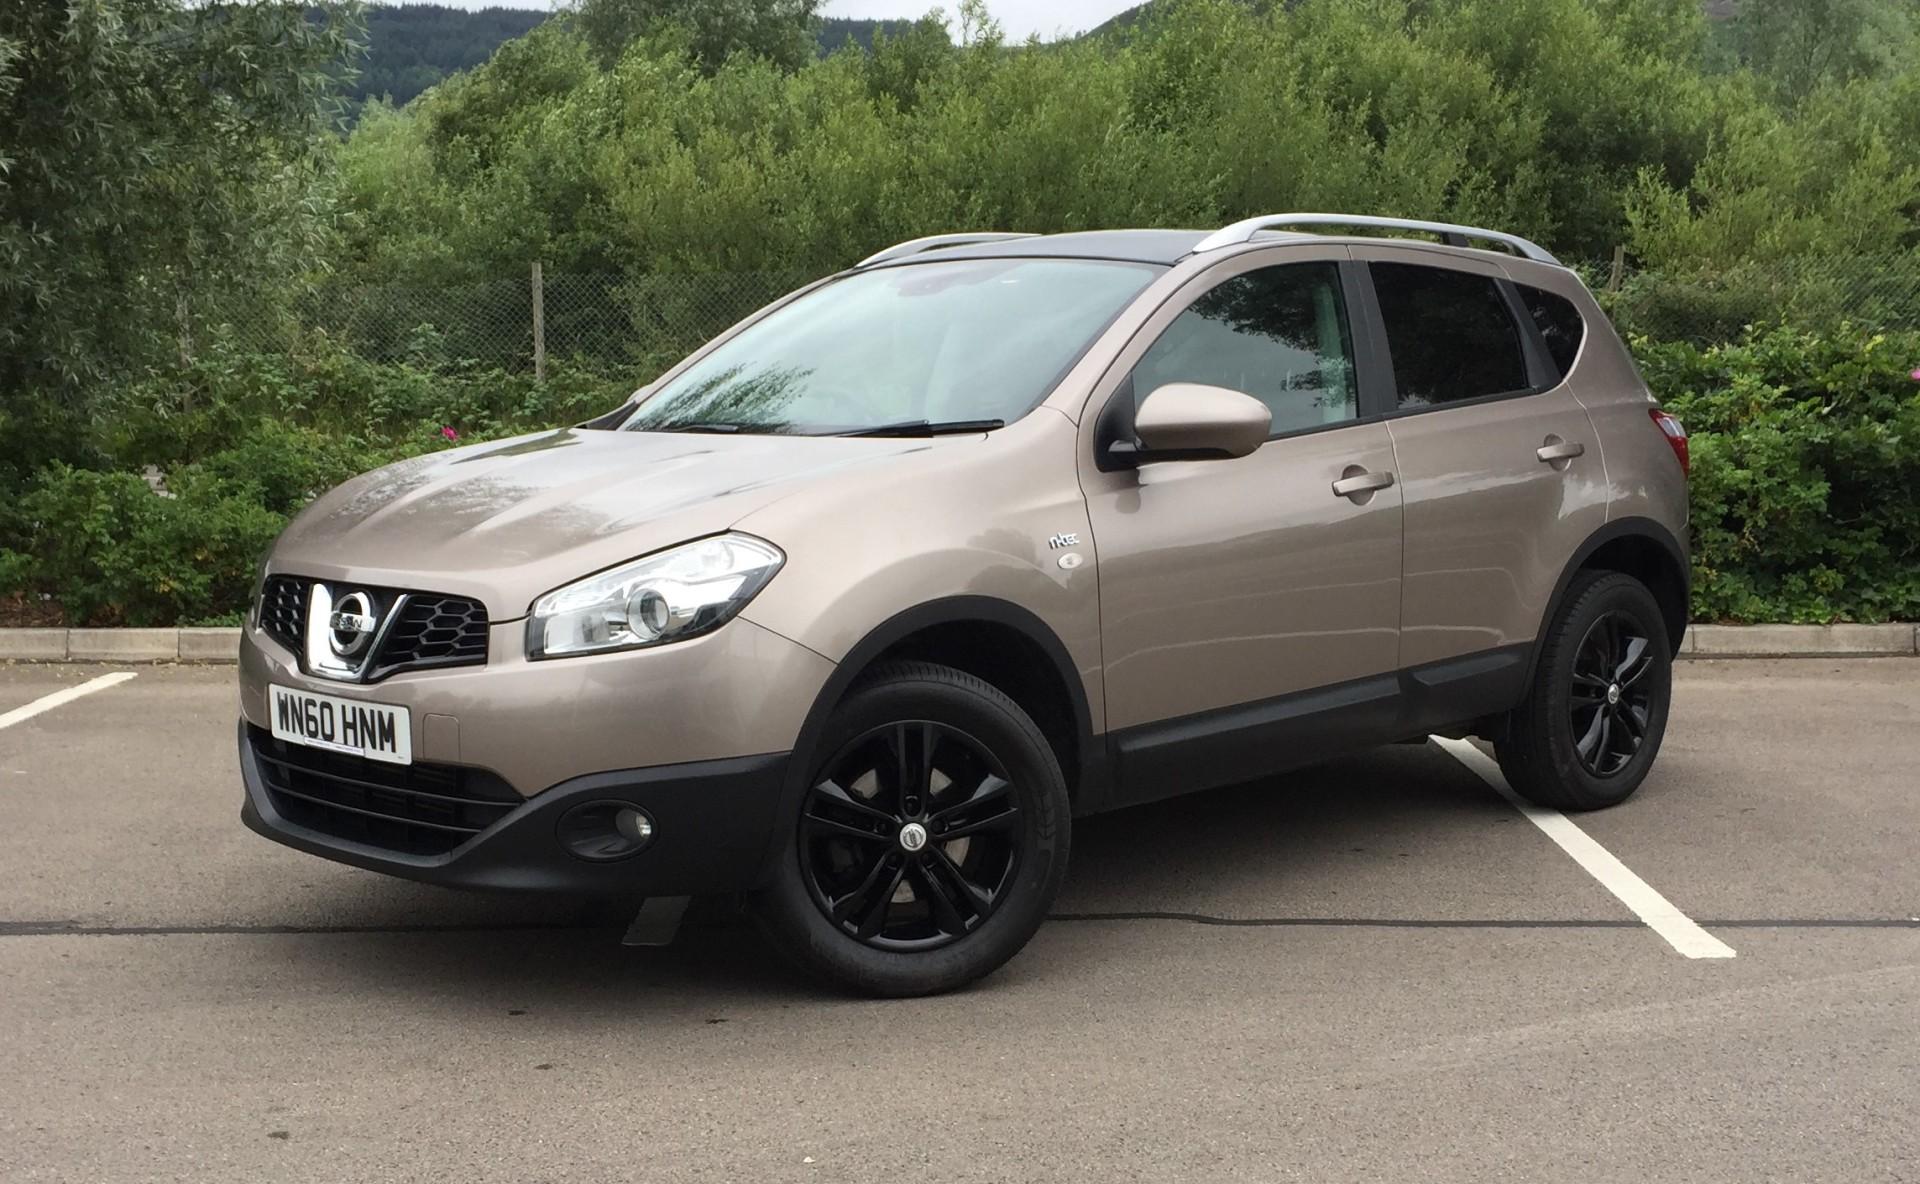 £34/week £6,675 Nissan Qashqai 1.5DCi N-Tec 90,368 Miles